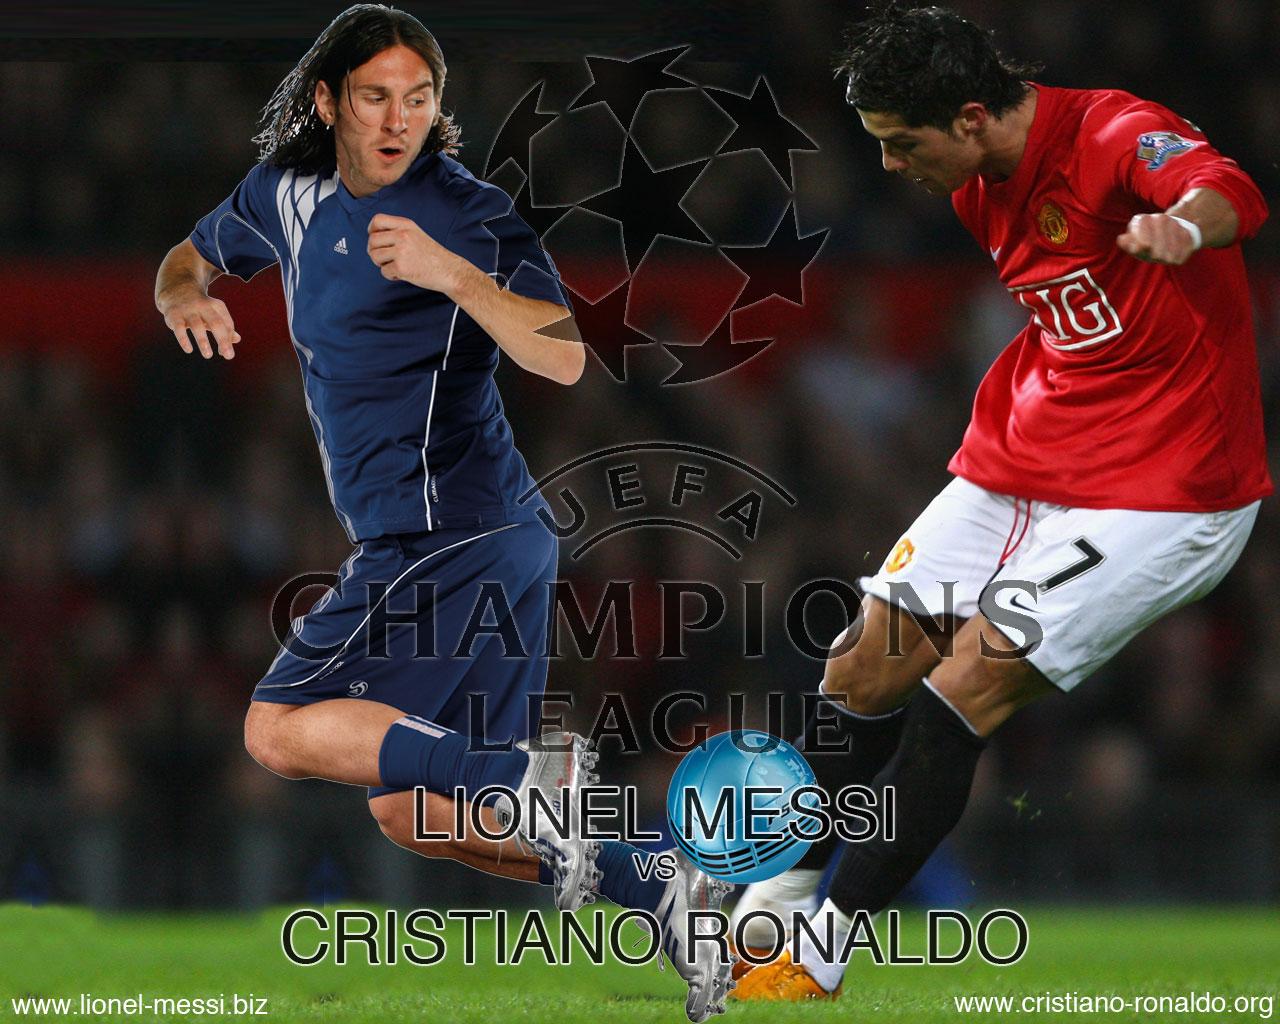 http://4.bp.blogspot.com/_6tTxpMI0Sa0/S9nECN9EYOI/AAAAAAAAAGA/R9WjSmLhkrw/s1600/cristiano-ronaldo-vs-lionel-messi-192.jpg